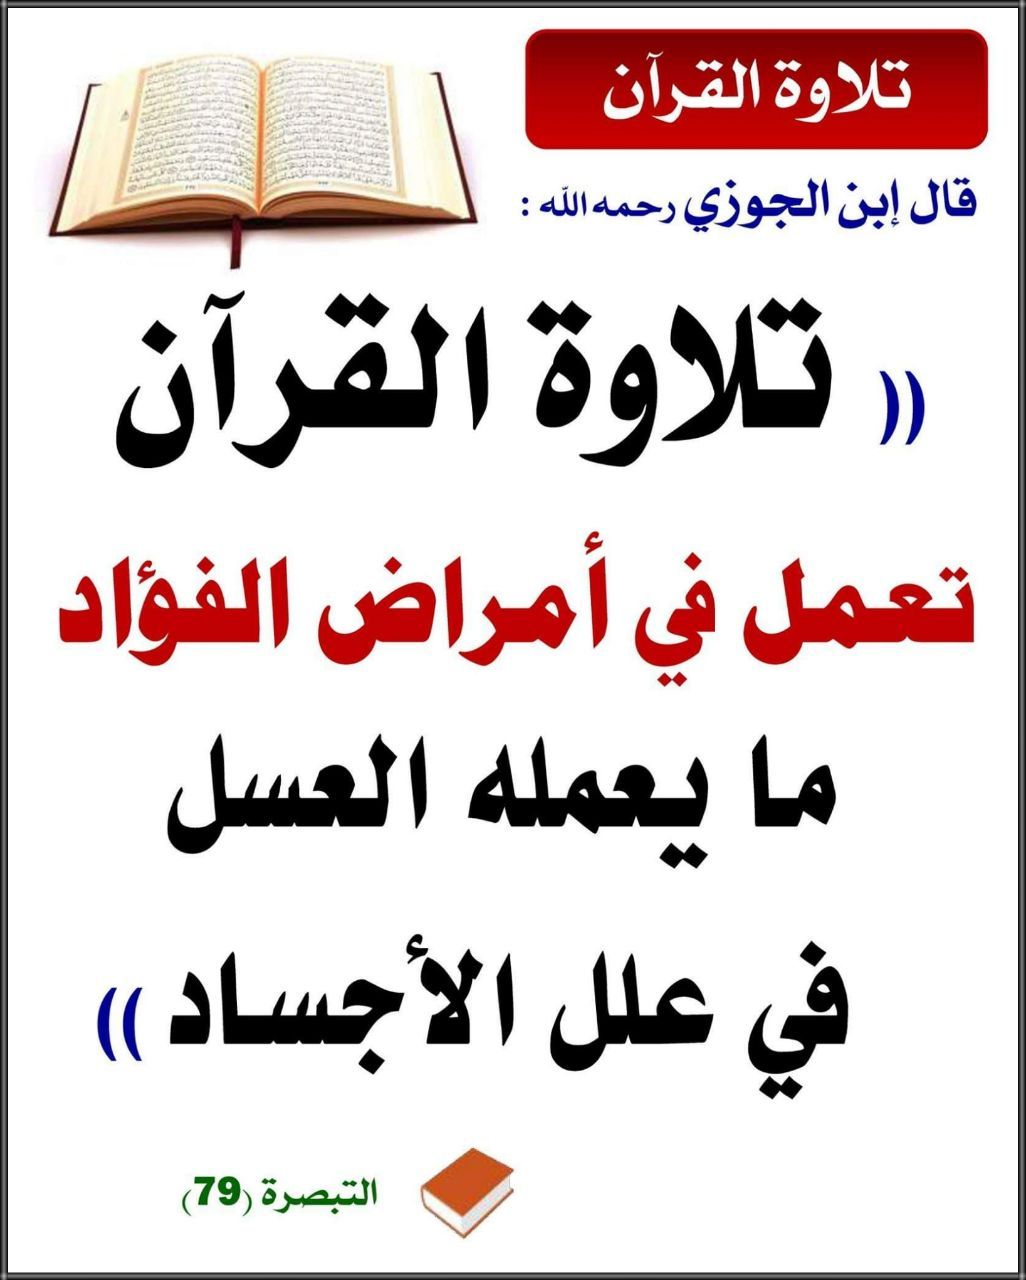 Pin By Mohedin Ibrahim On أقوال الصحابة والعلماء Islam Facts Islamic Messages Islamic Phrases